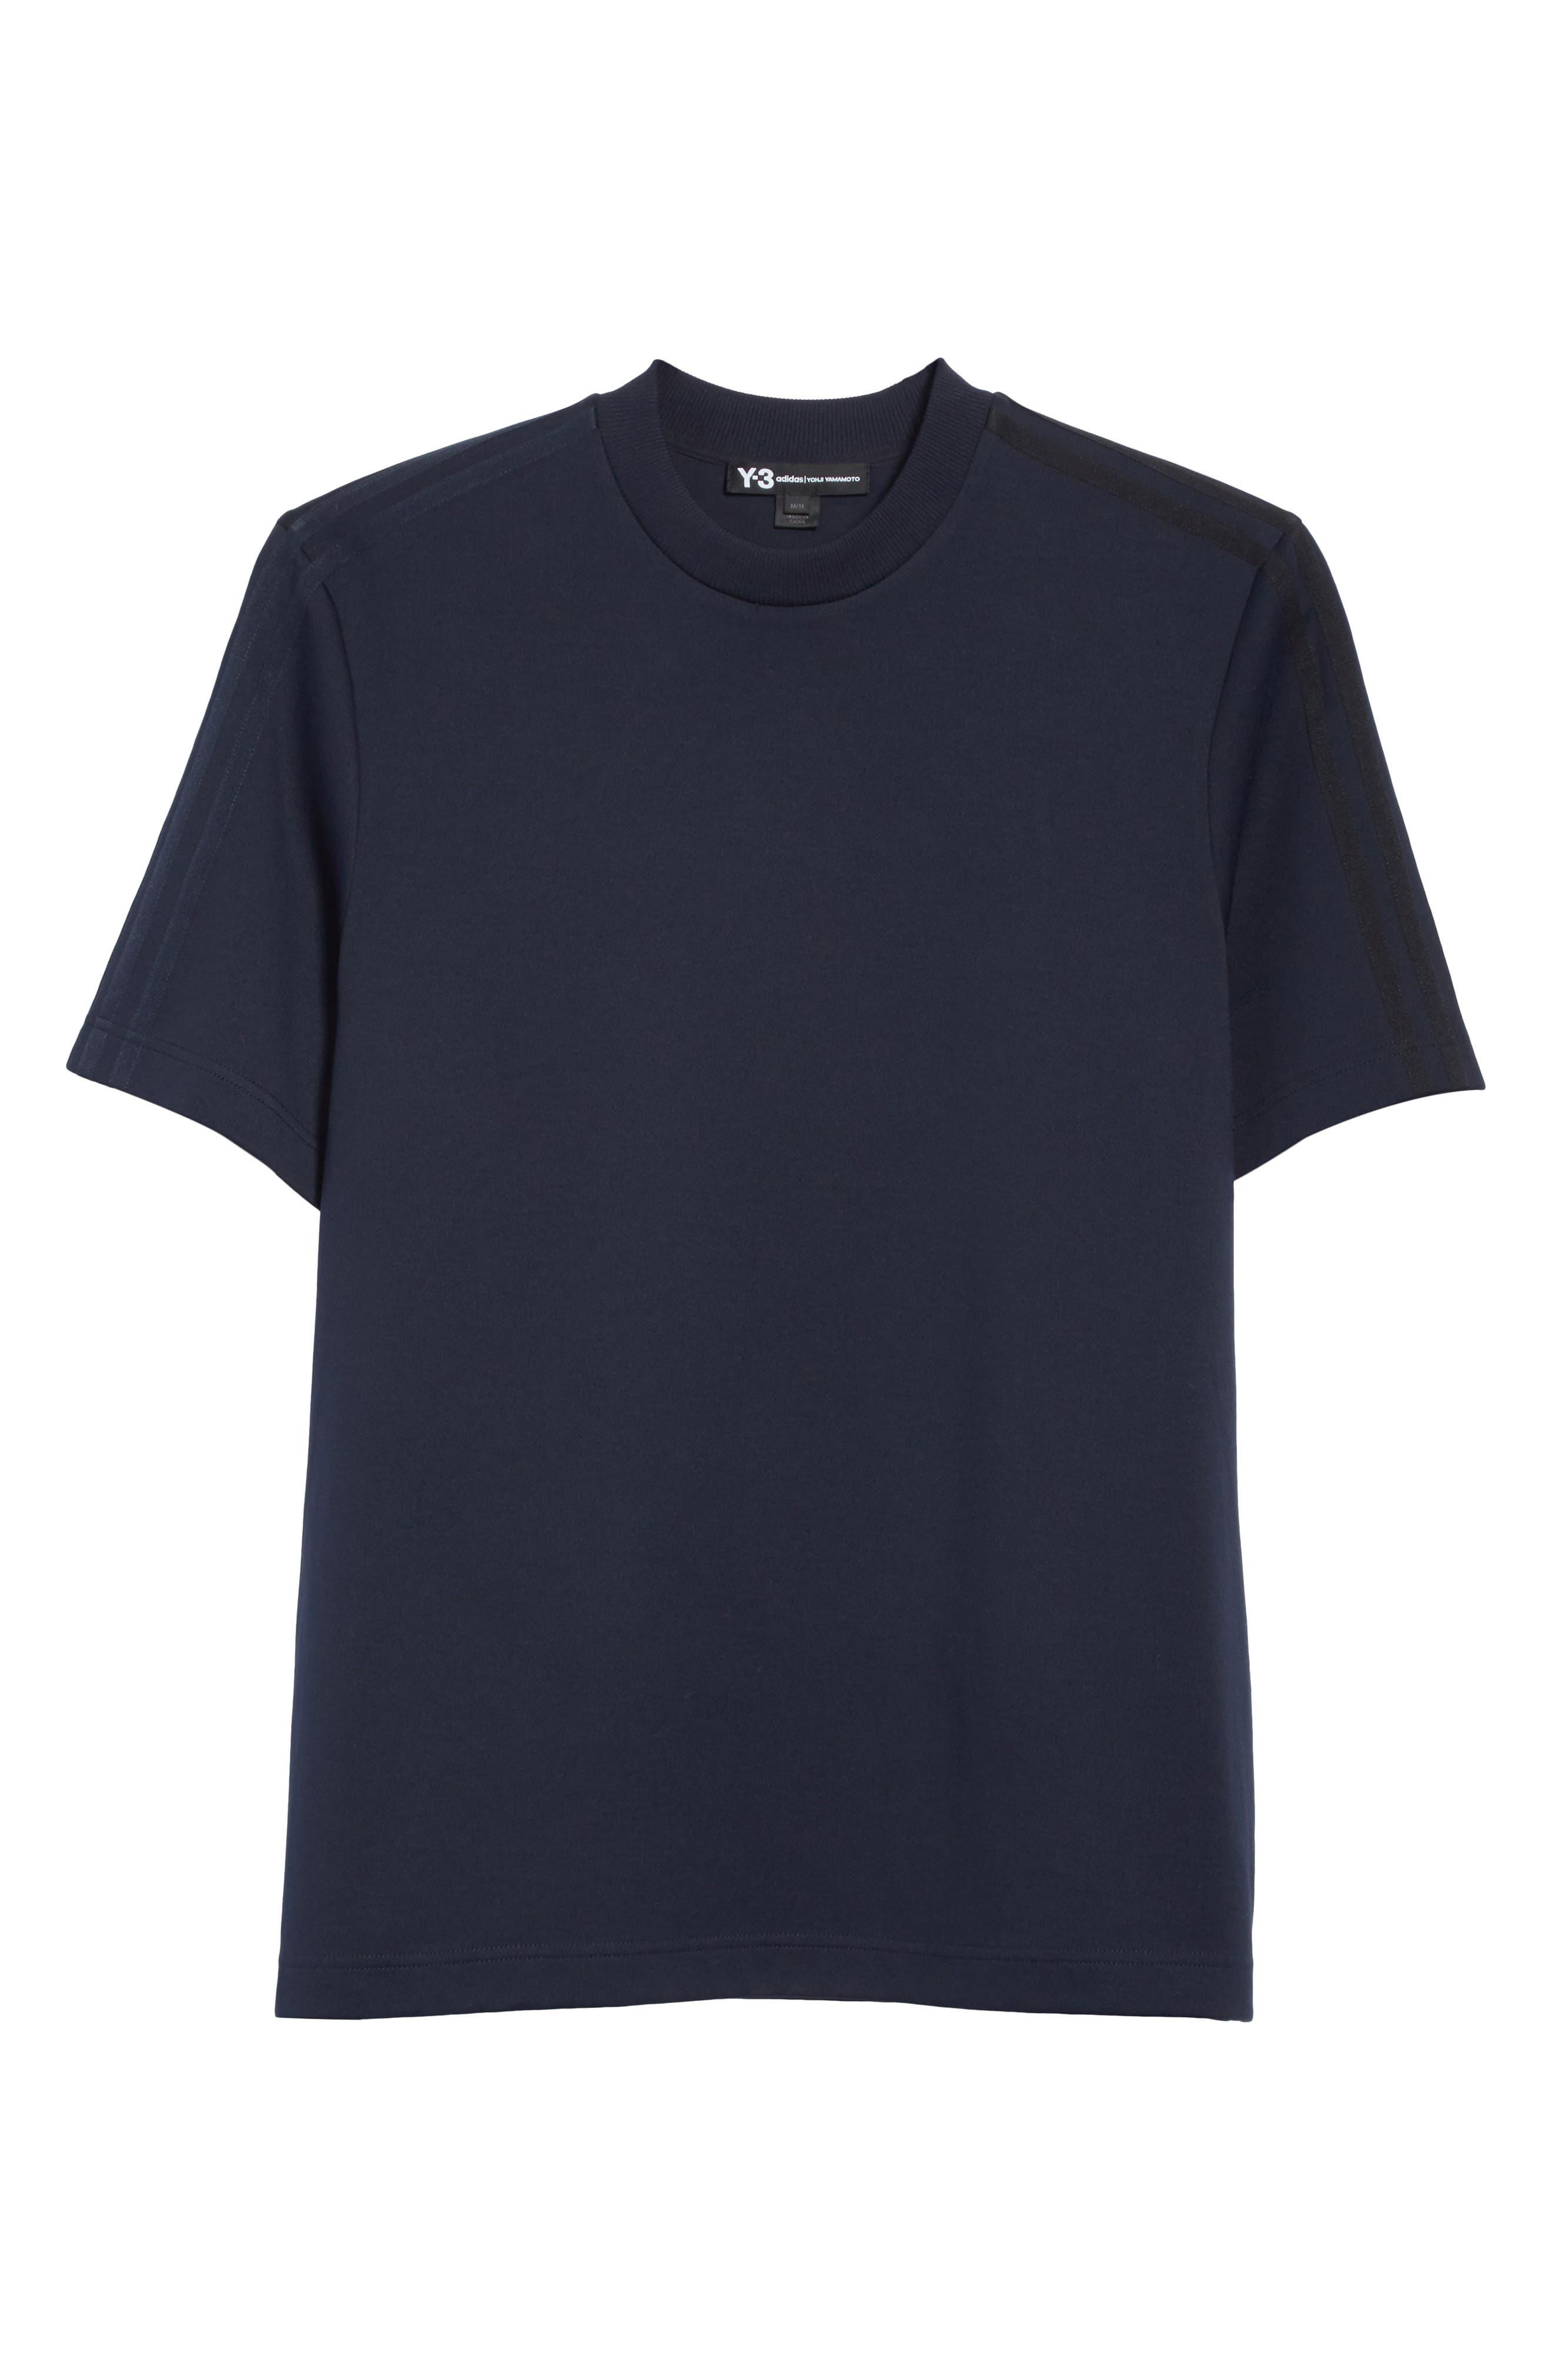 x adidas Tonal Stripe Crewneck T-Shirt,                             Alternate thumbnail 6, color,                             Navy